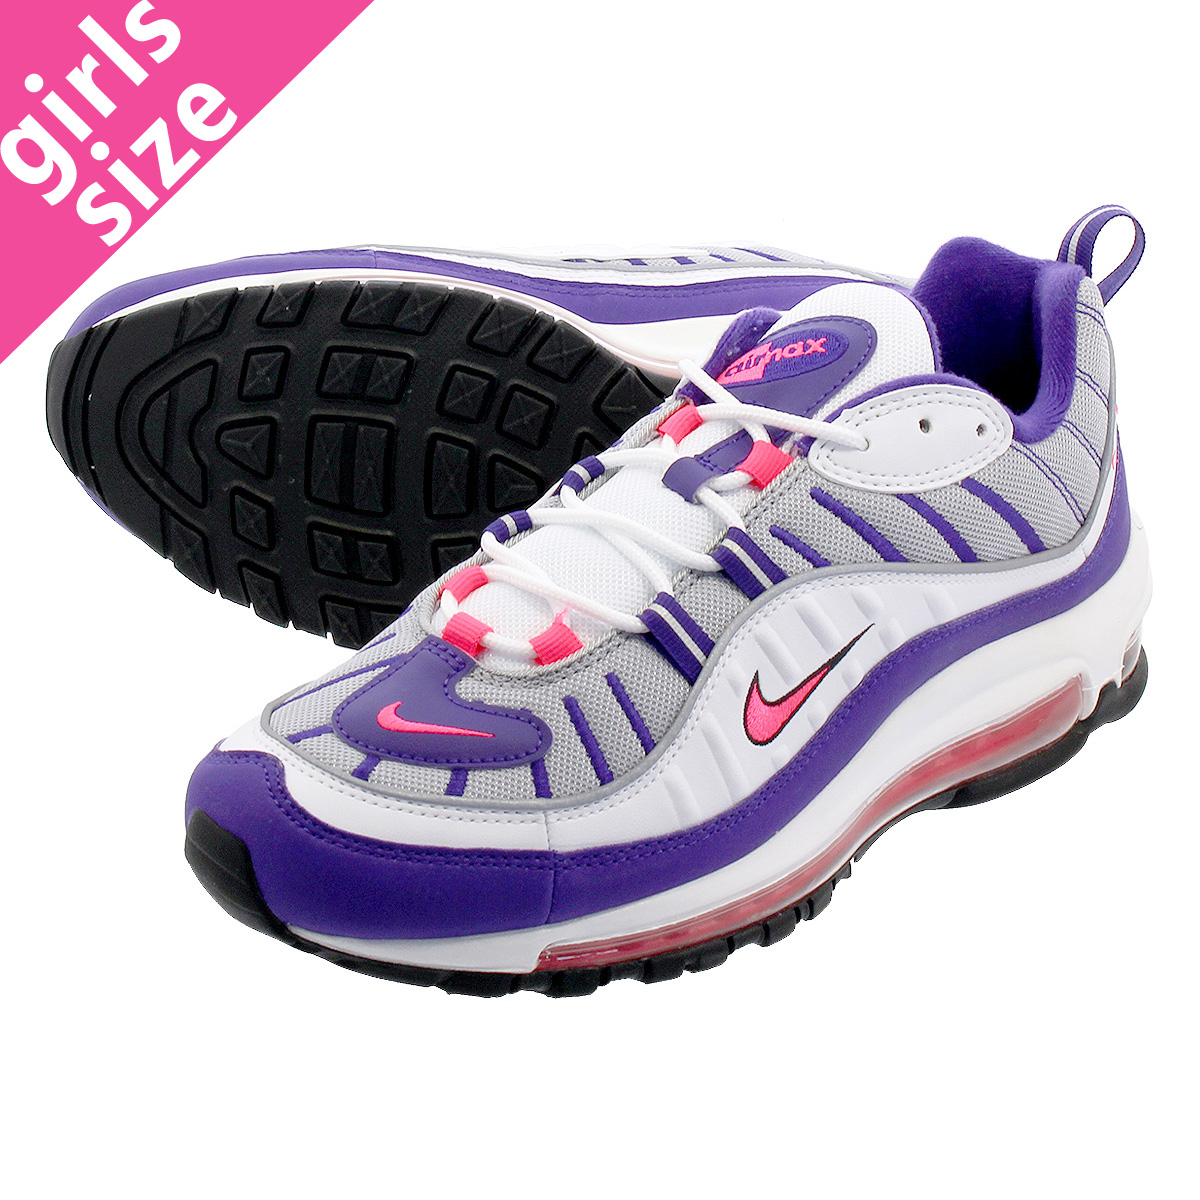 reputable site 0dc0c 94c7b NIKE WMNS AIR MAX 98 Nike women Air Max 98 WHITE RACER PINK REFLECT ...